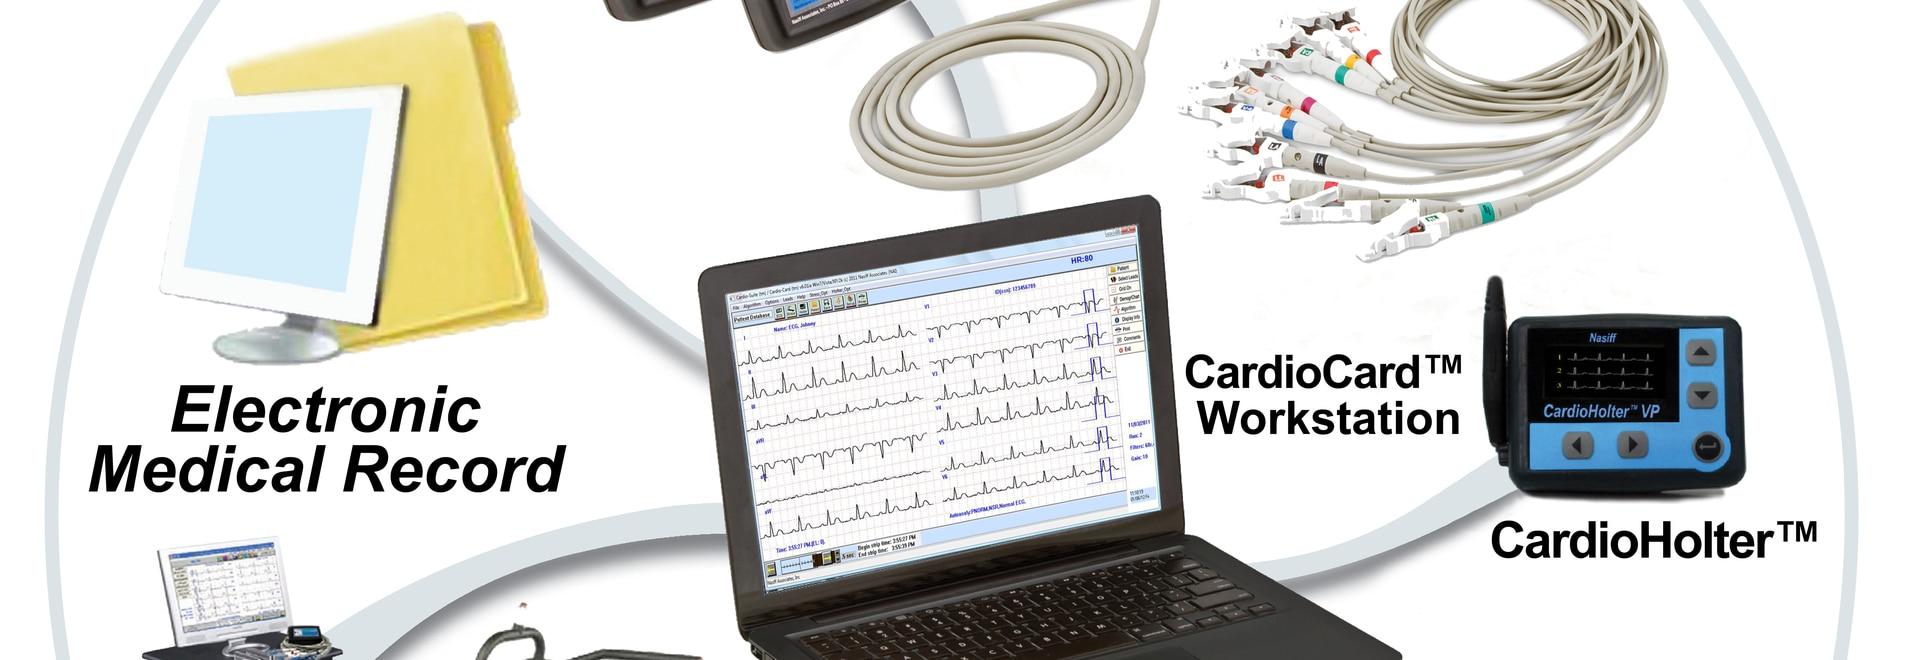 Nasiff CardioCard Universal EMR Interface™ Database System: PC Based ECG System